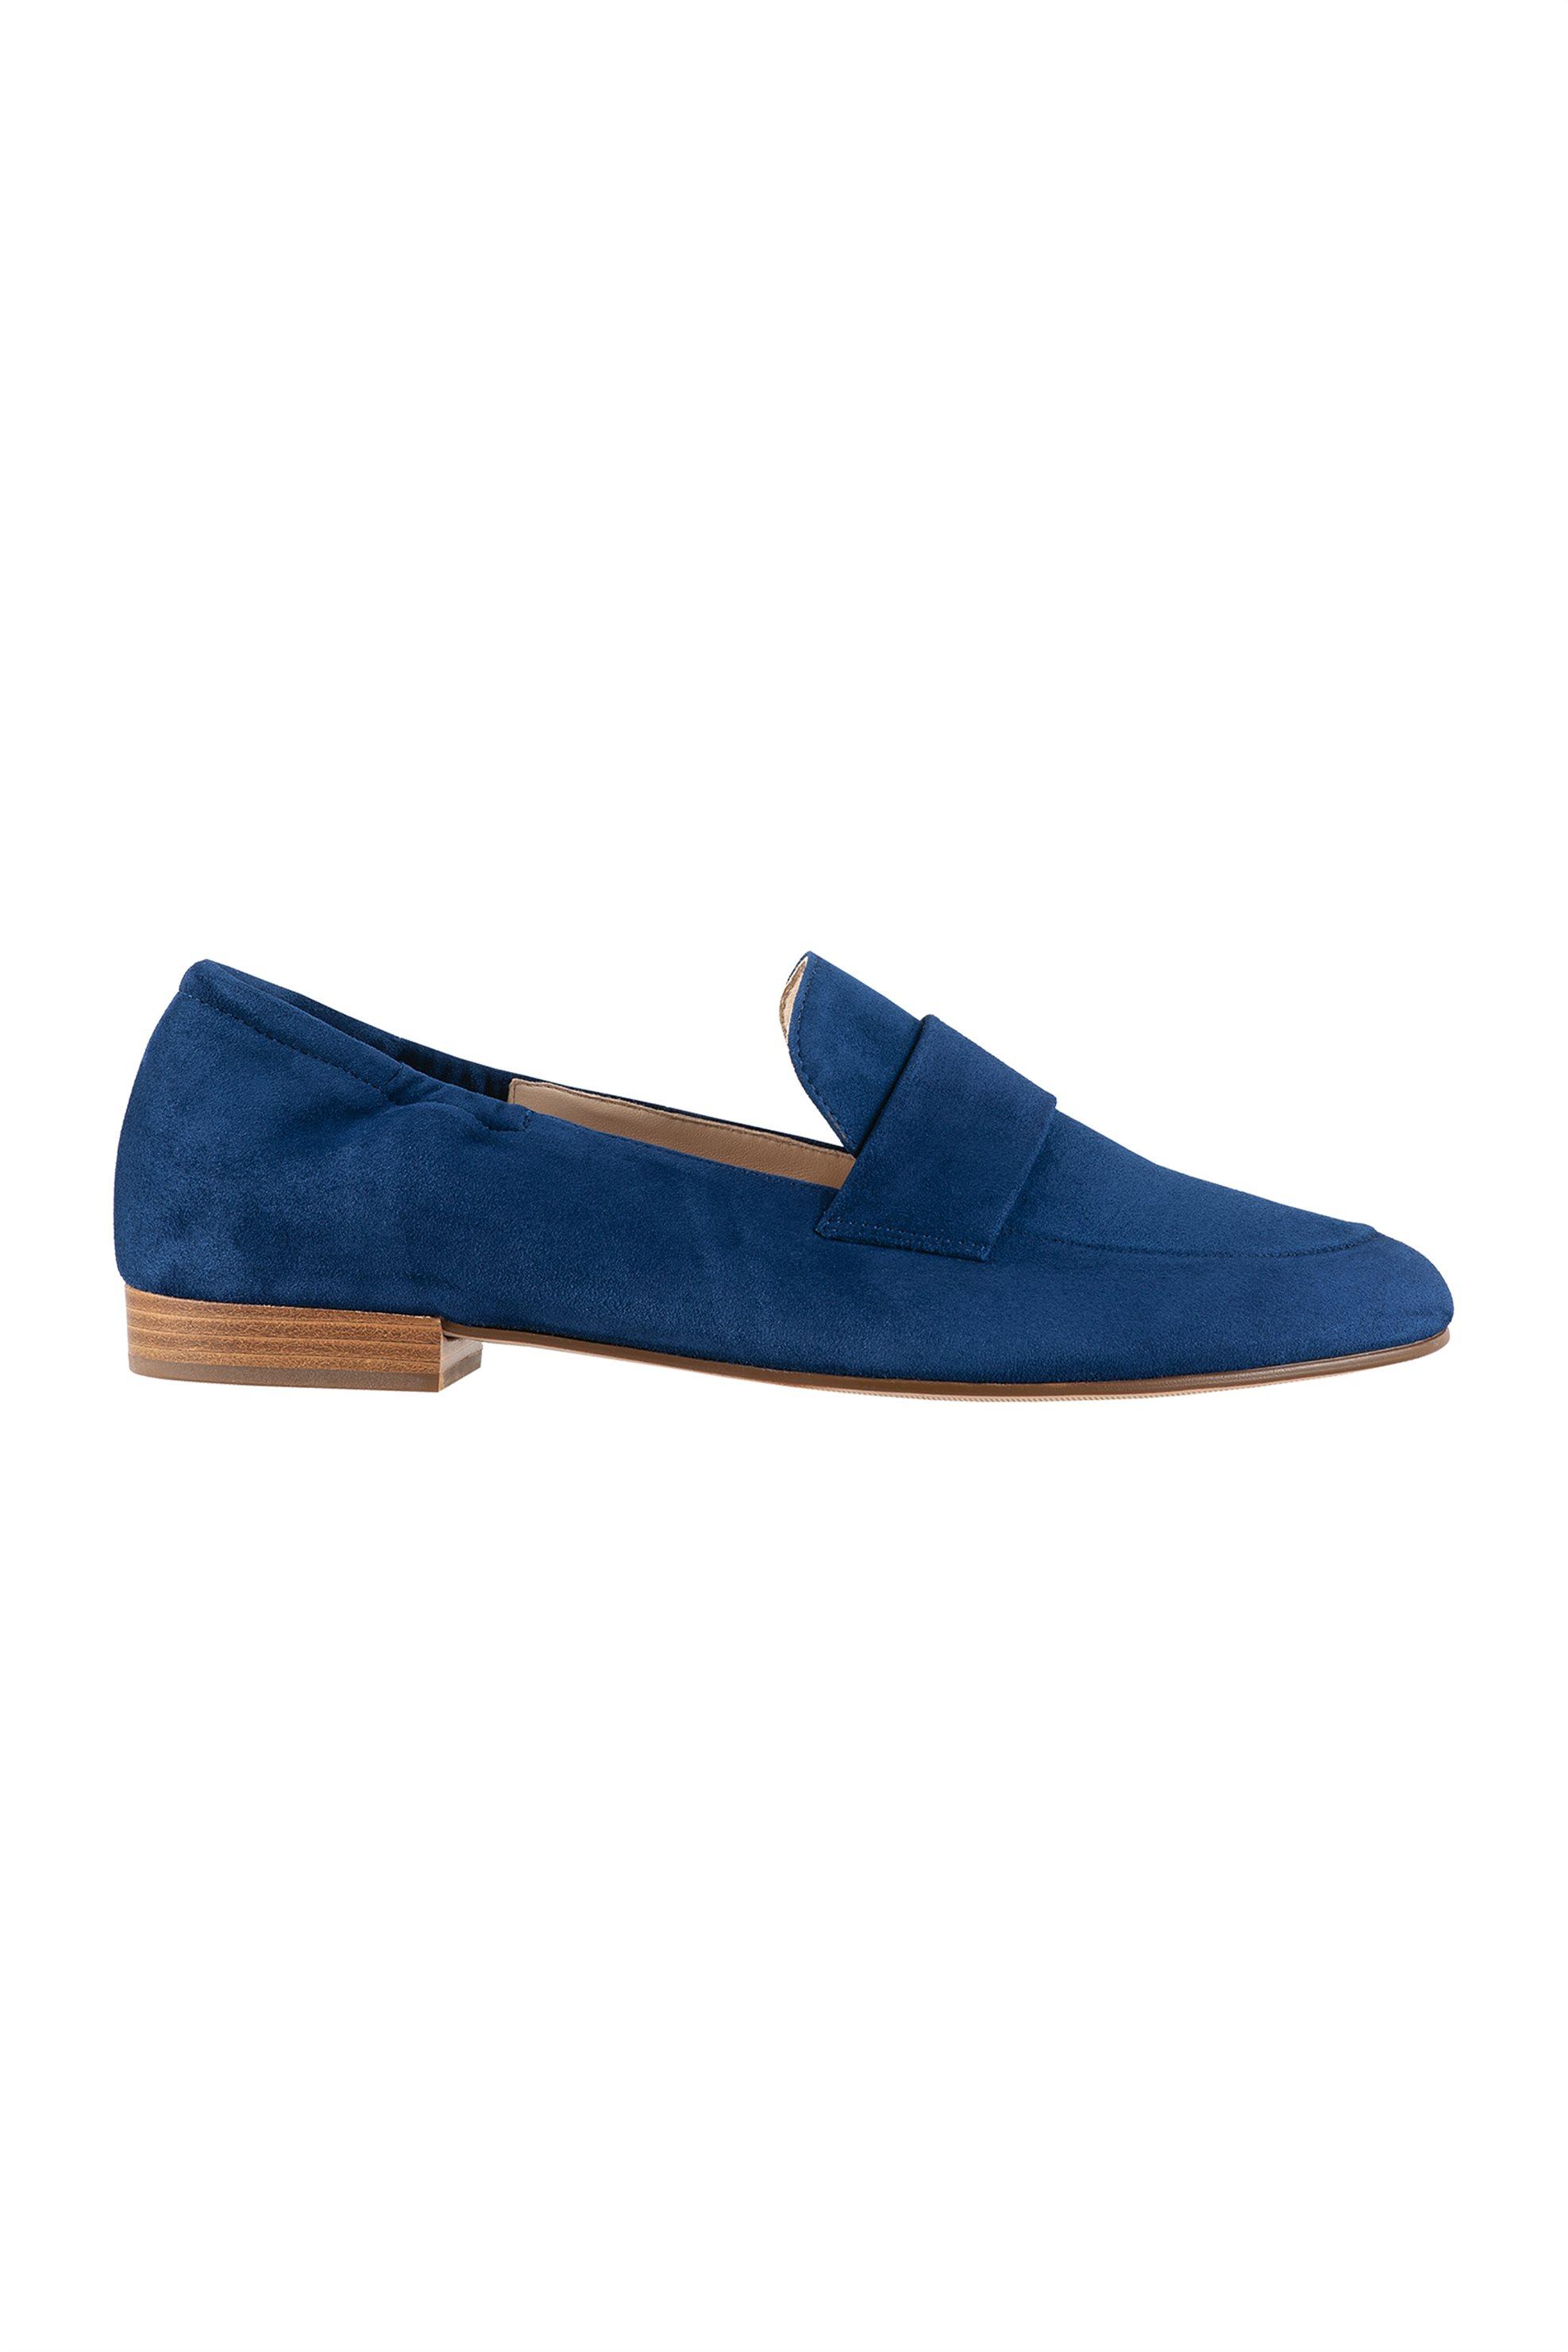 Högl γυναικεία suede loafers